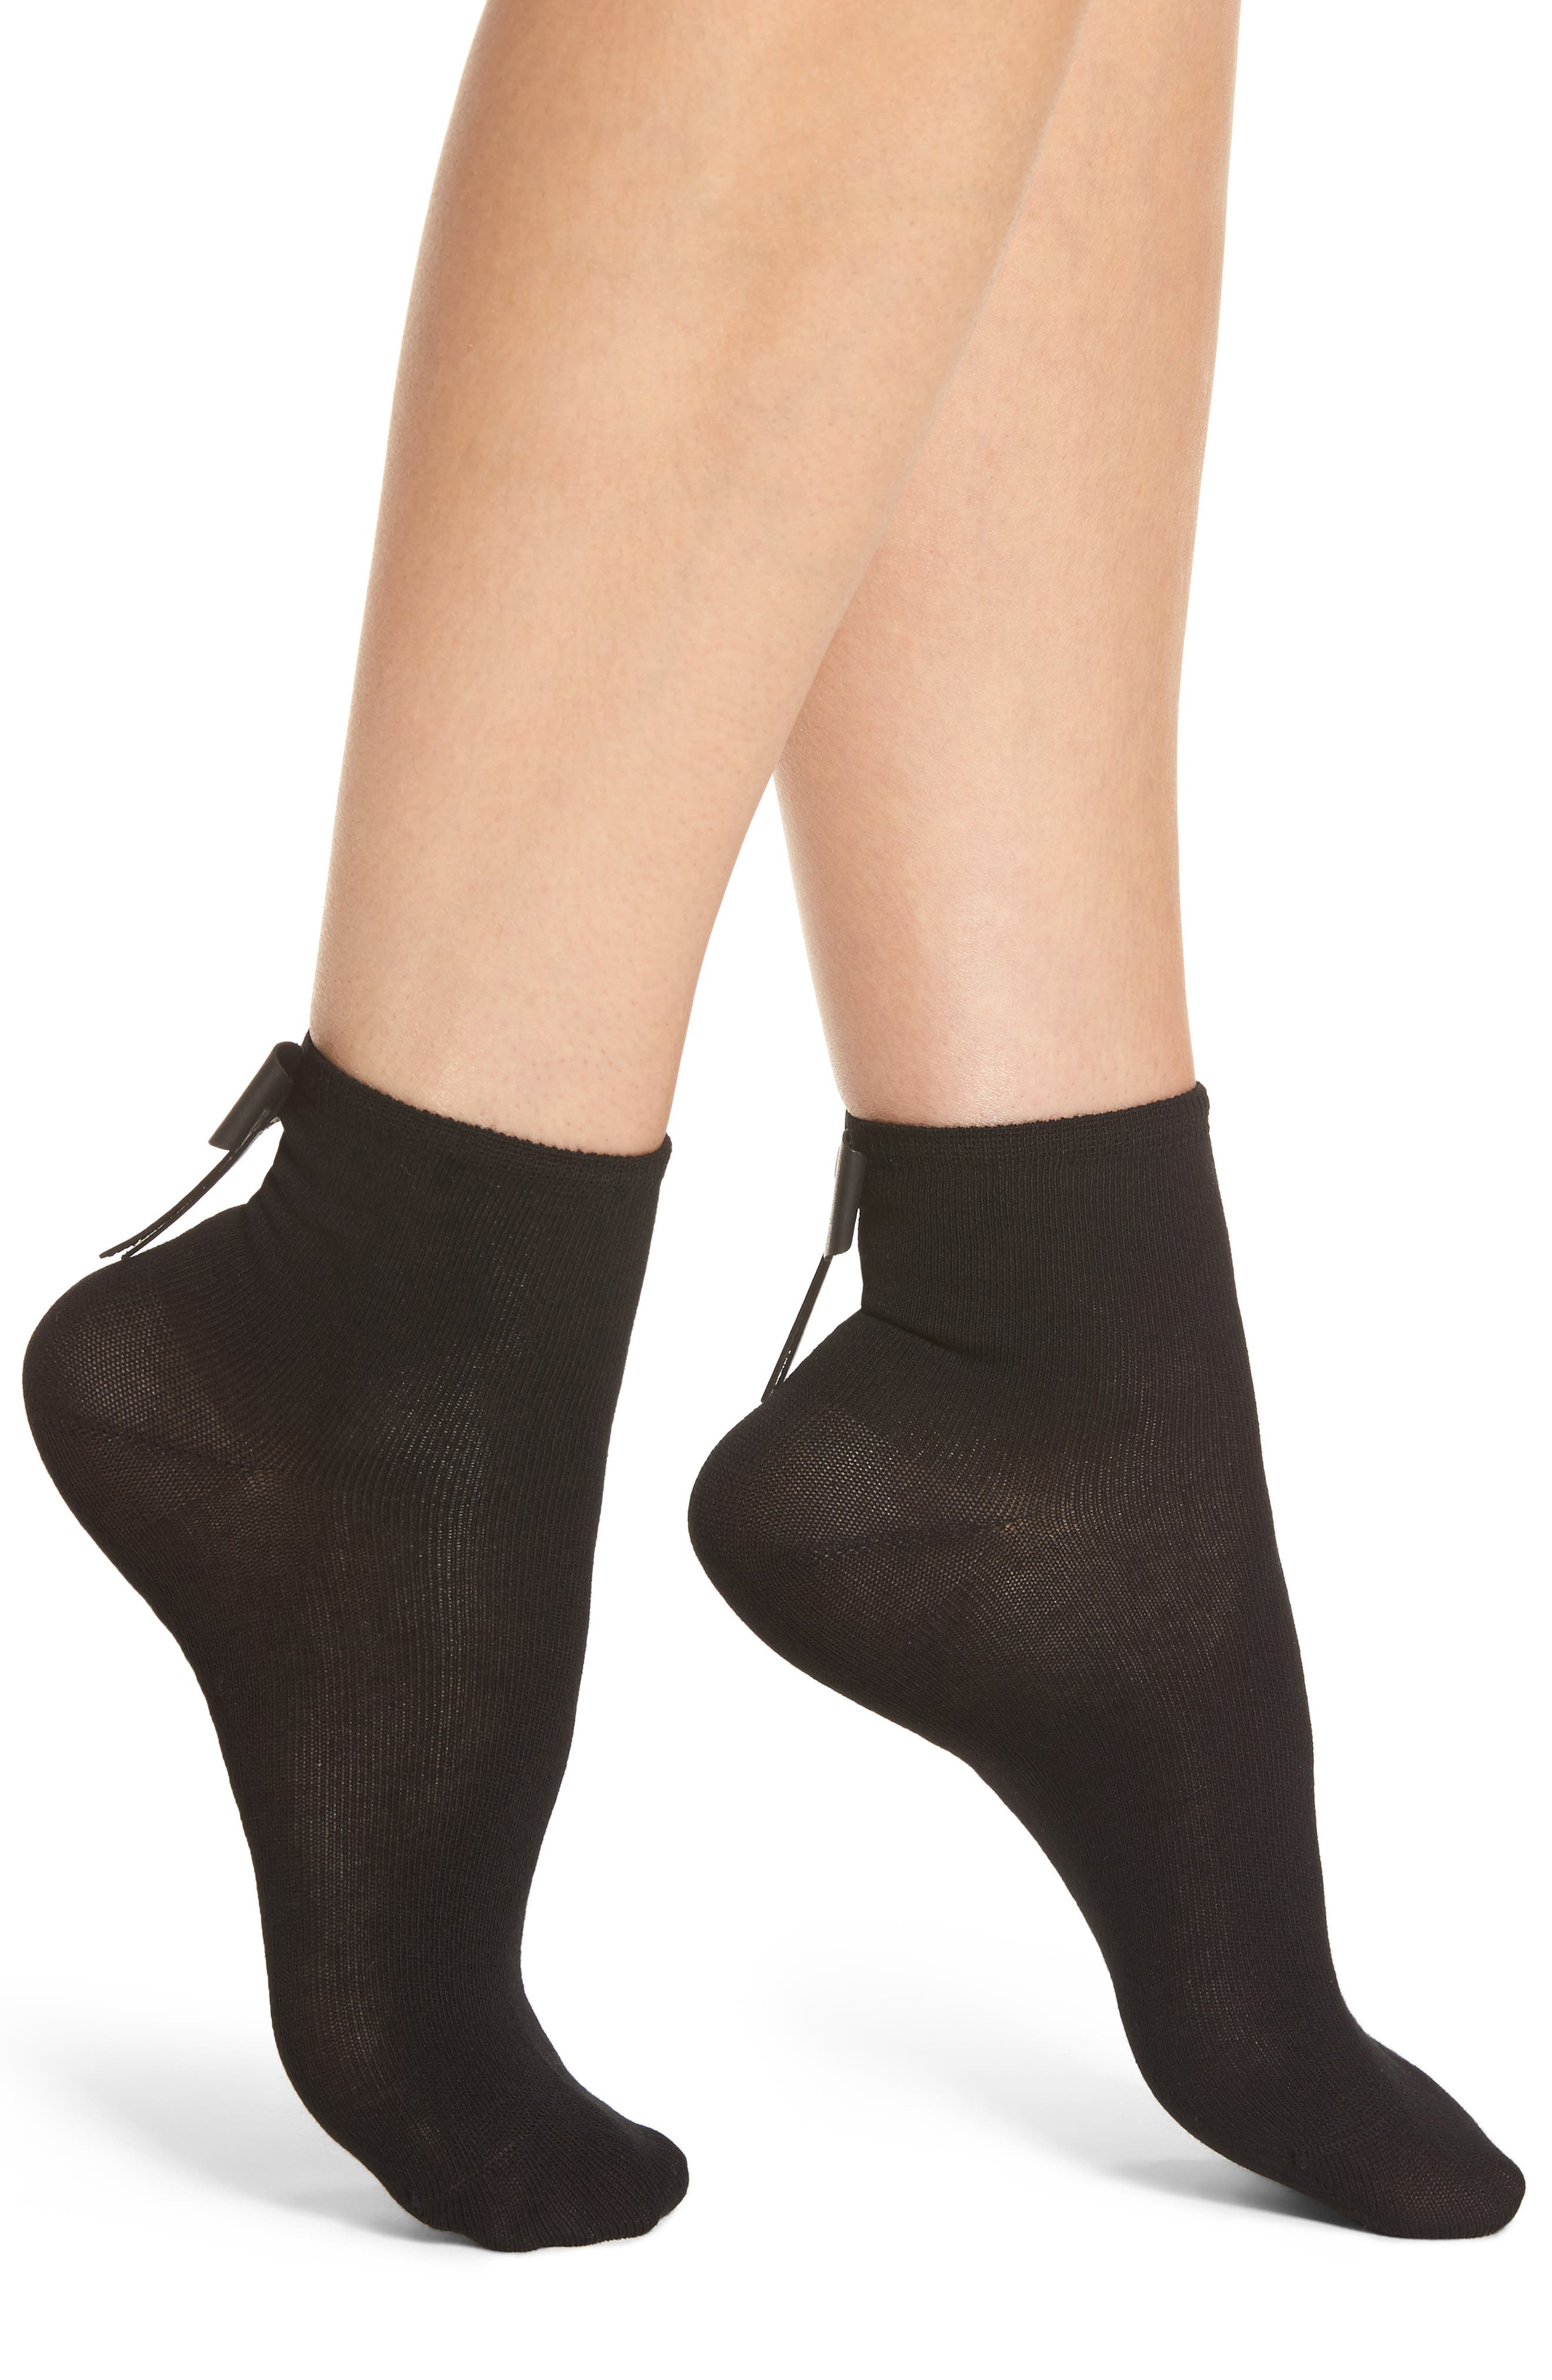 Bow Socks,                         Main,                         color, Black